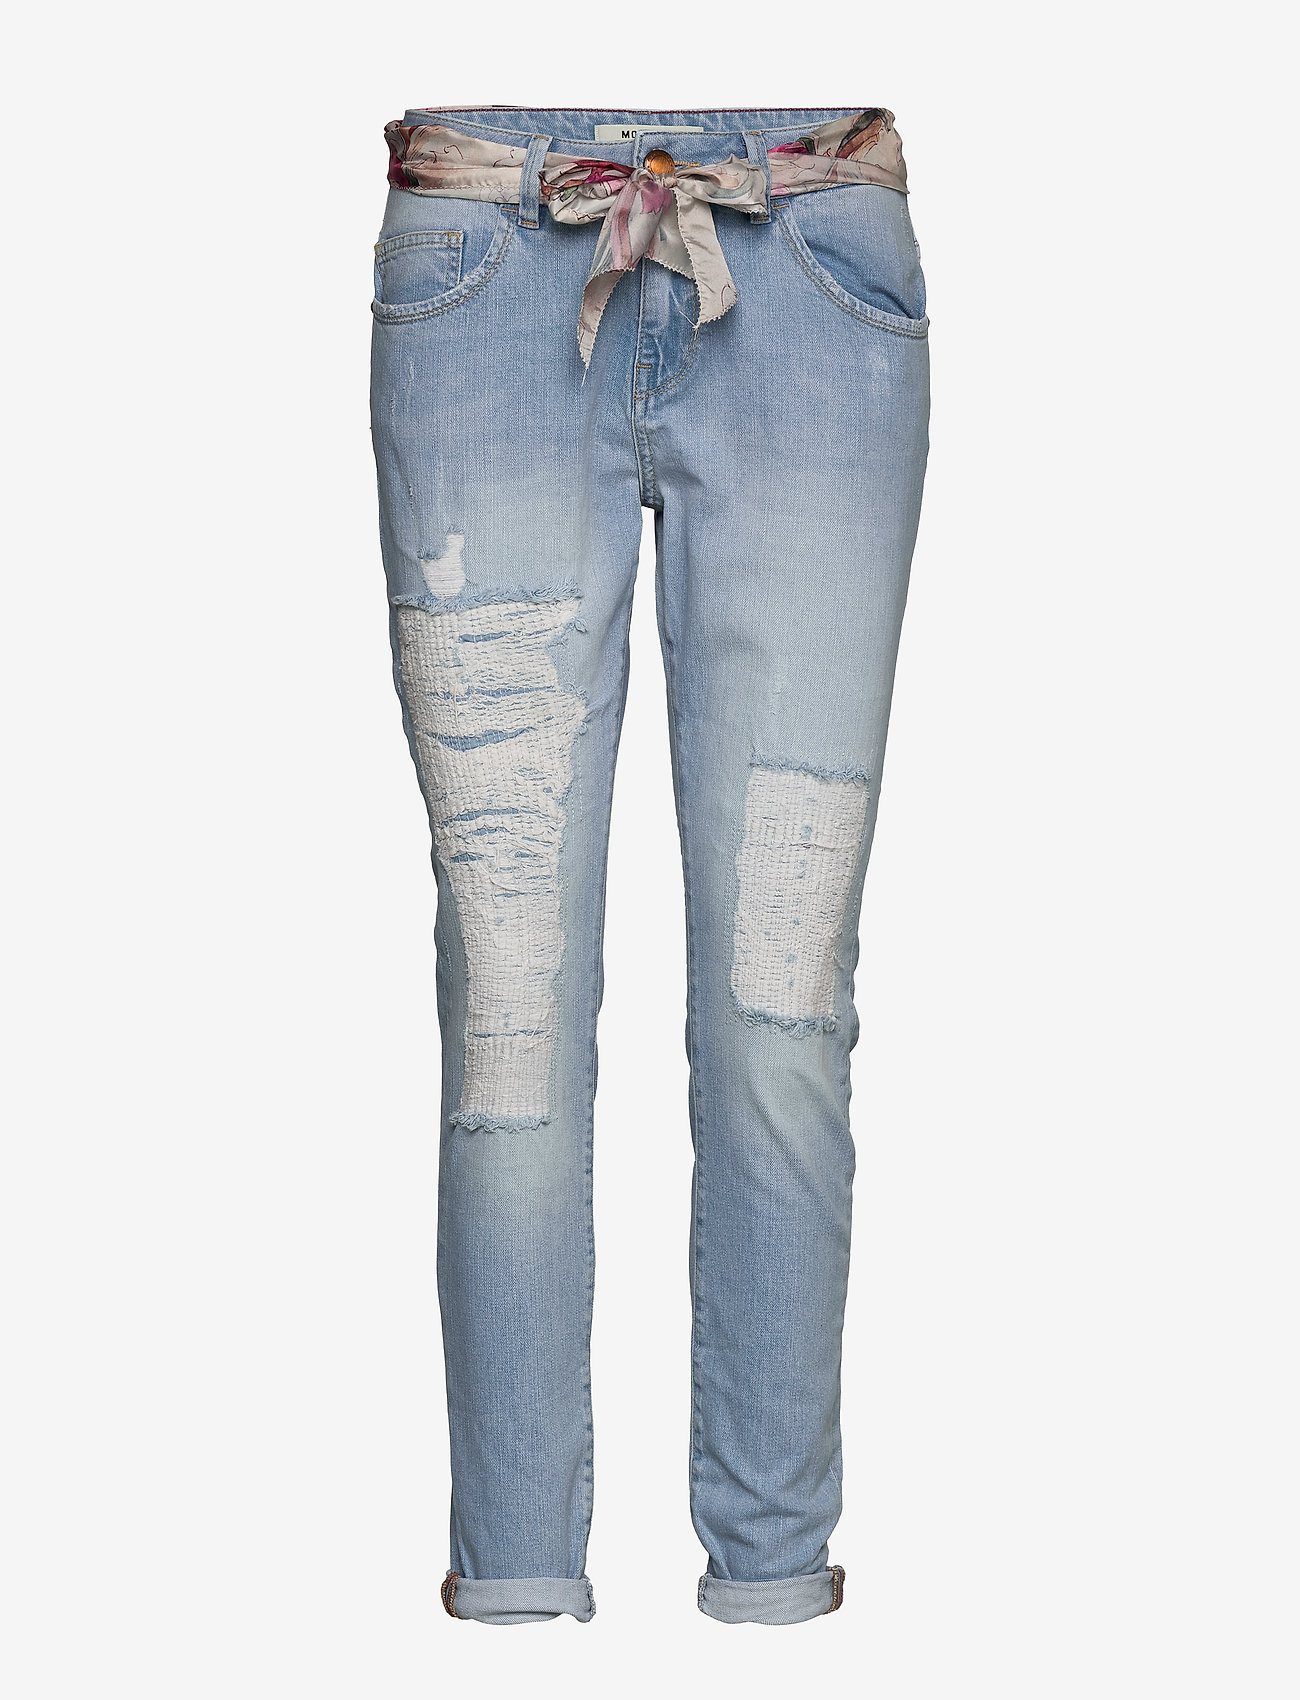 MOS MOSH - Bradford Bleach Jeans - dżinsy chłopaka - bleached blue - 0